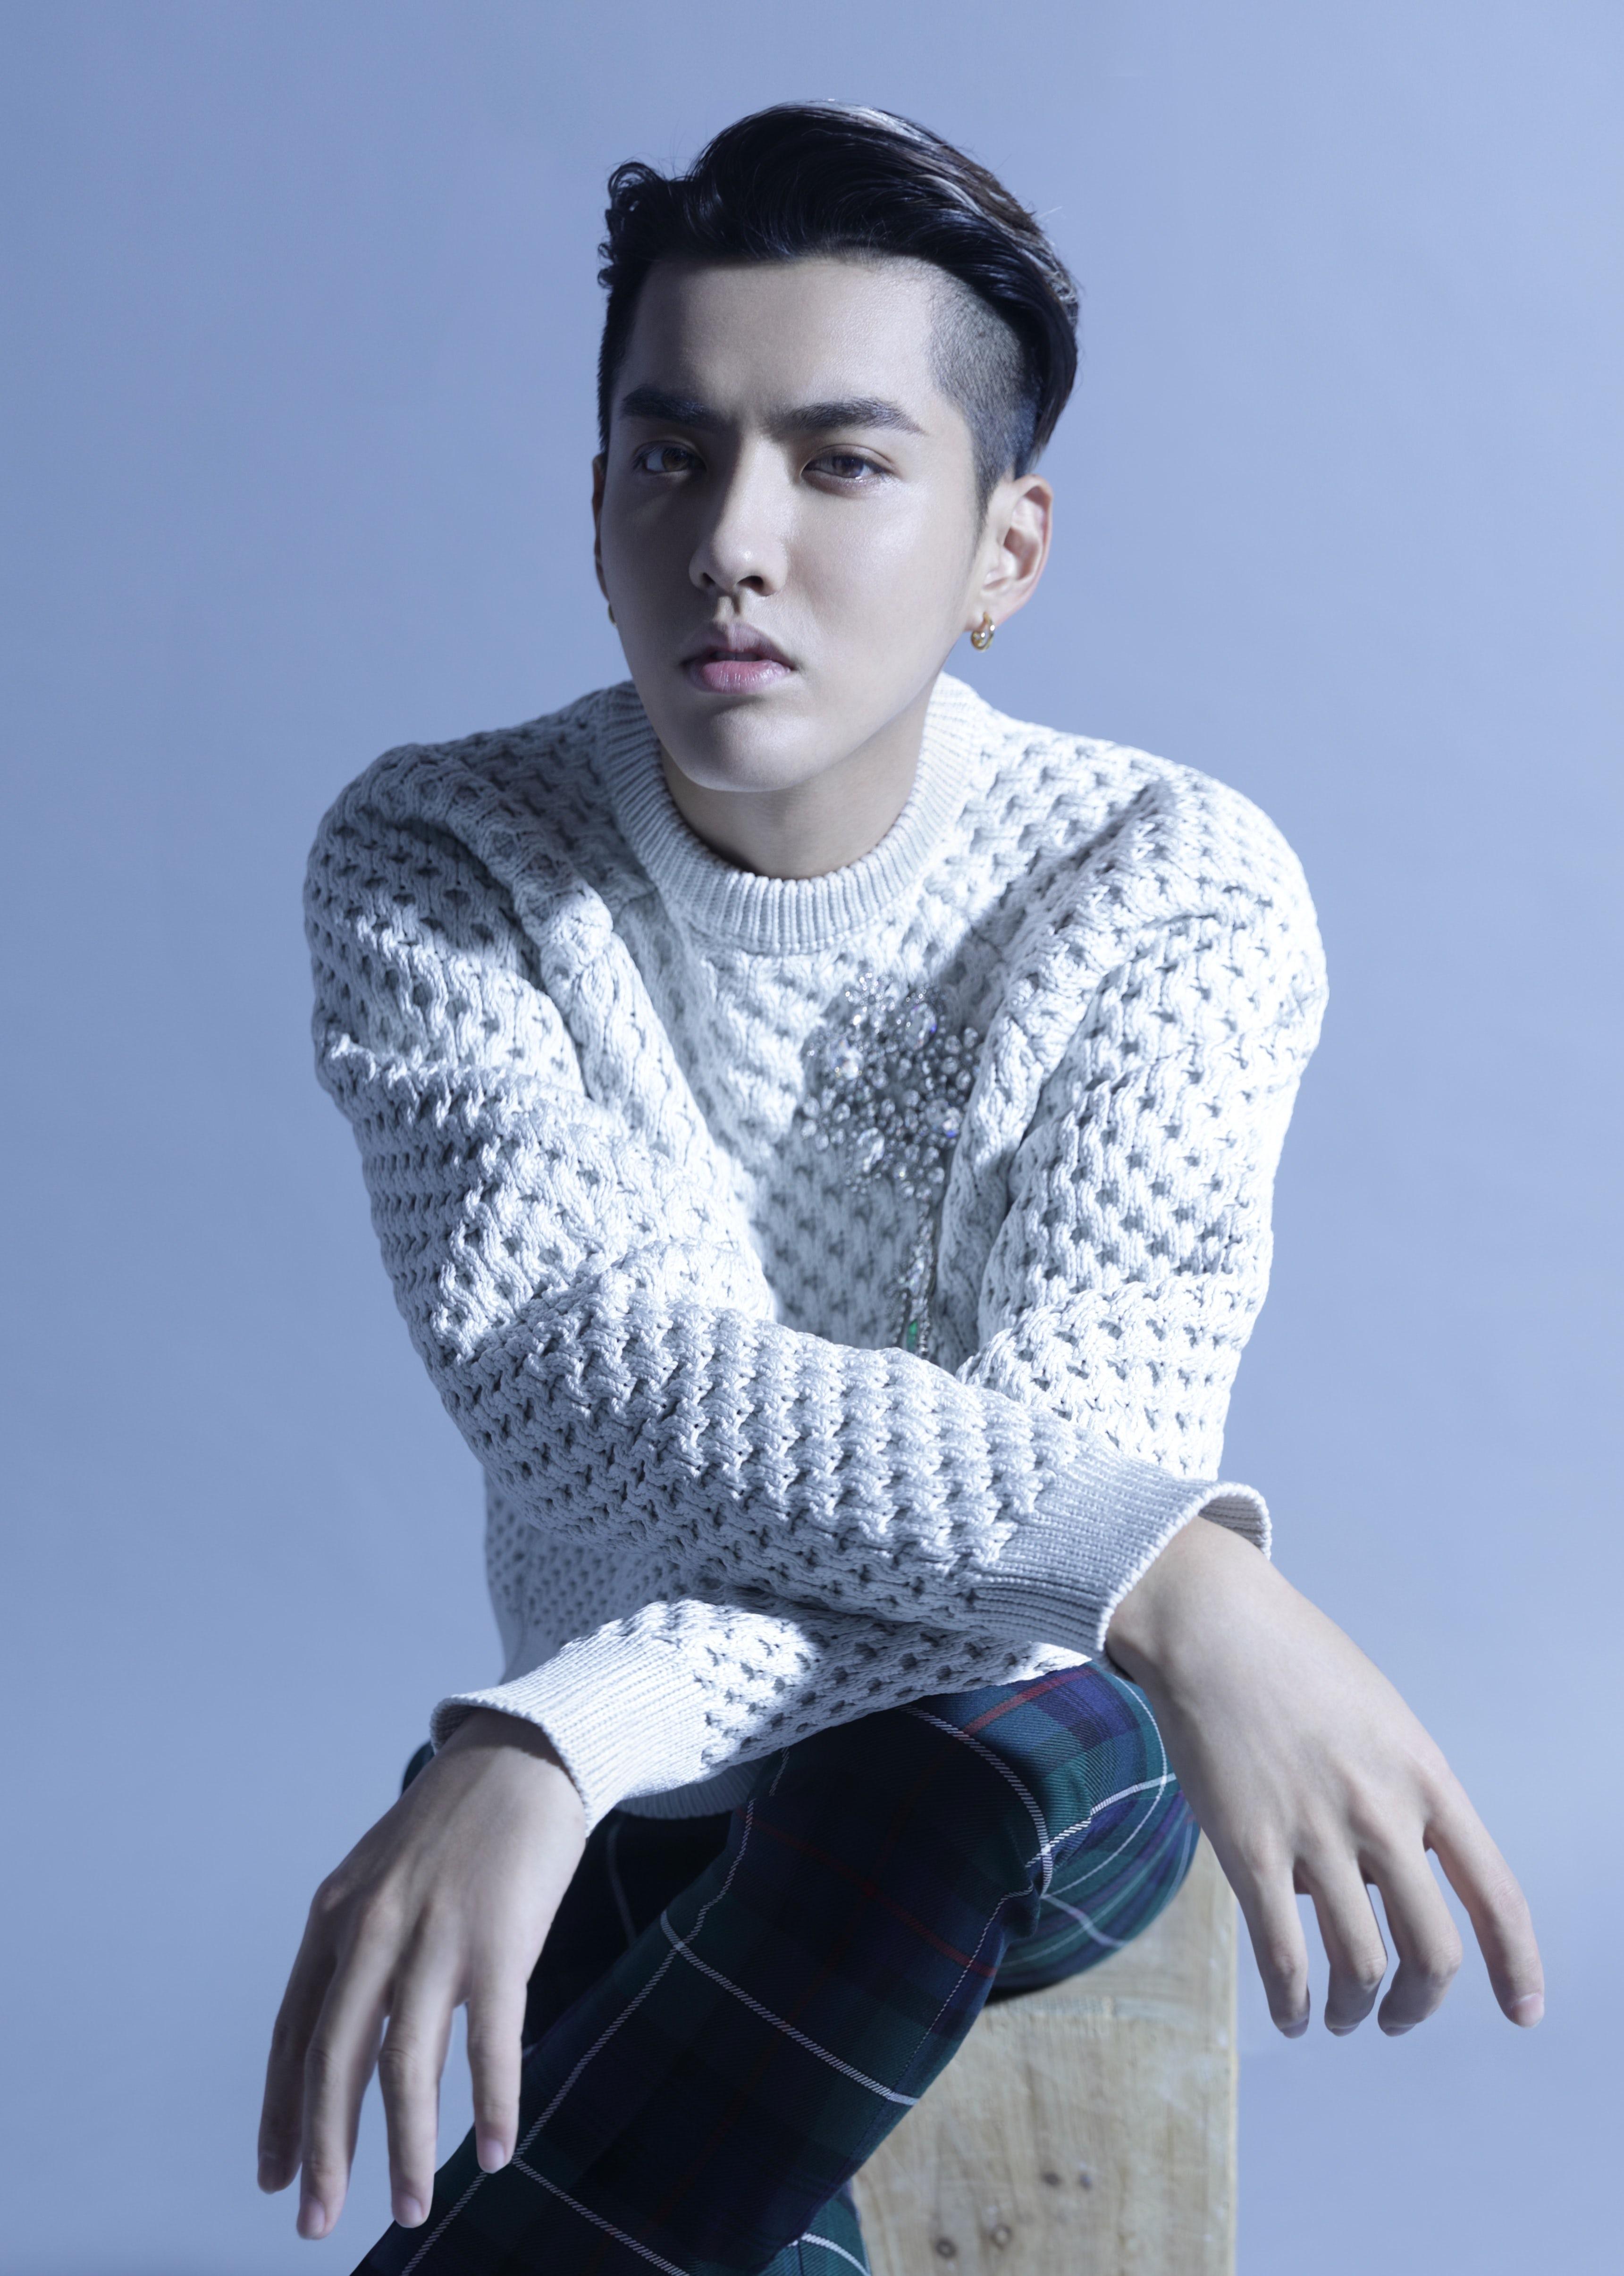 Kris Wu photographed by Chen Man for BoF (stylist: Lucia Liu, makeup artist: Ki, hair stylist: Hong Junsung)